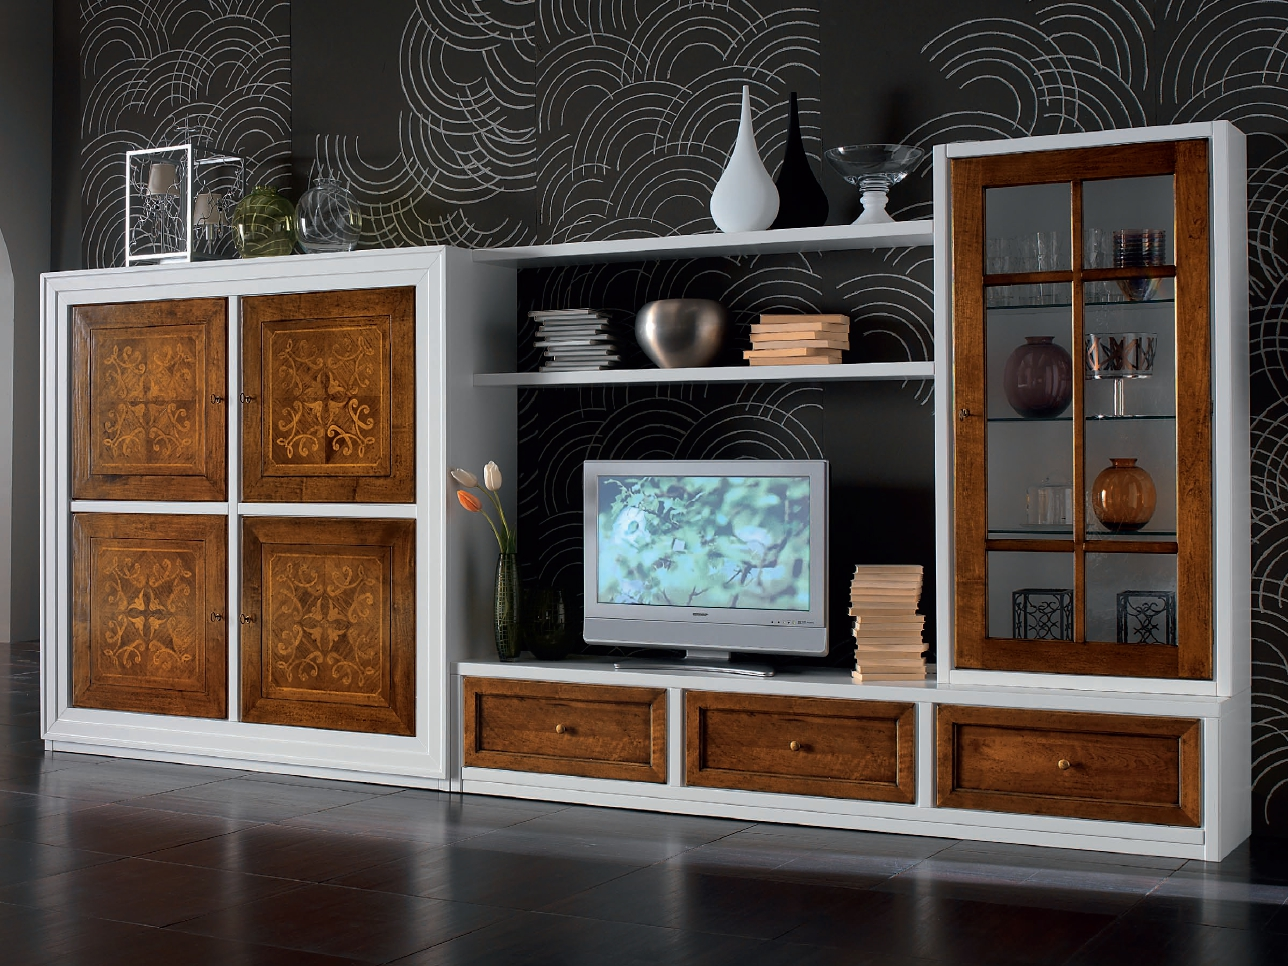 anbau wohnwand aus holz kollektion ca 39 venier by cantiero. Black Bedroom Furniture Sets. Home Design Ideas